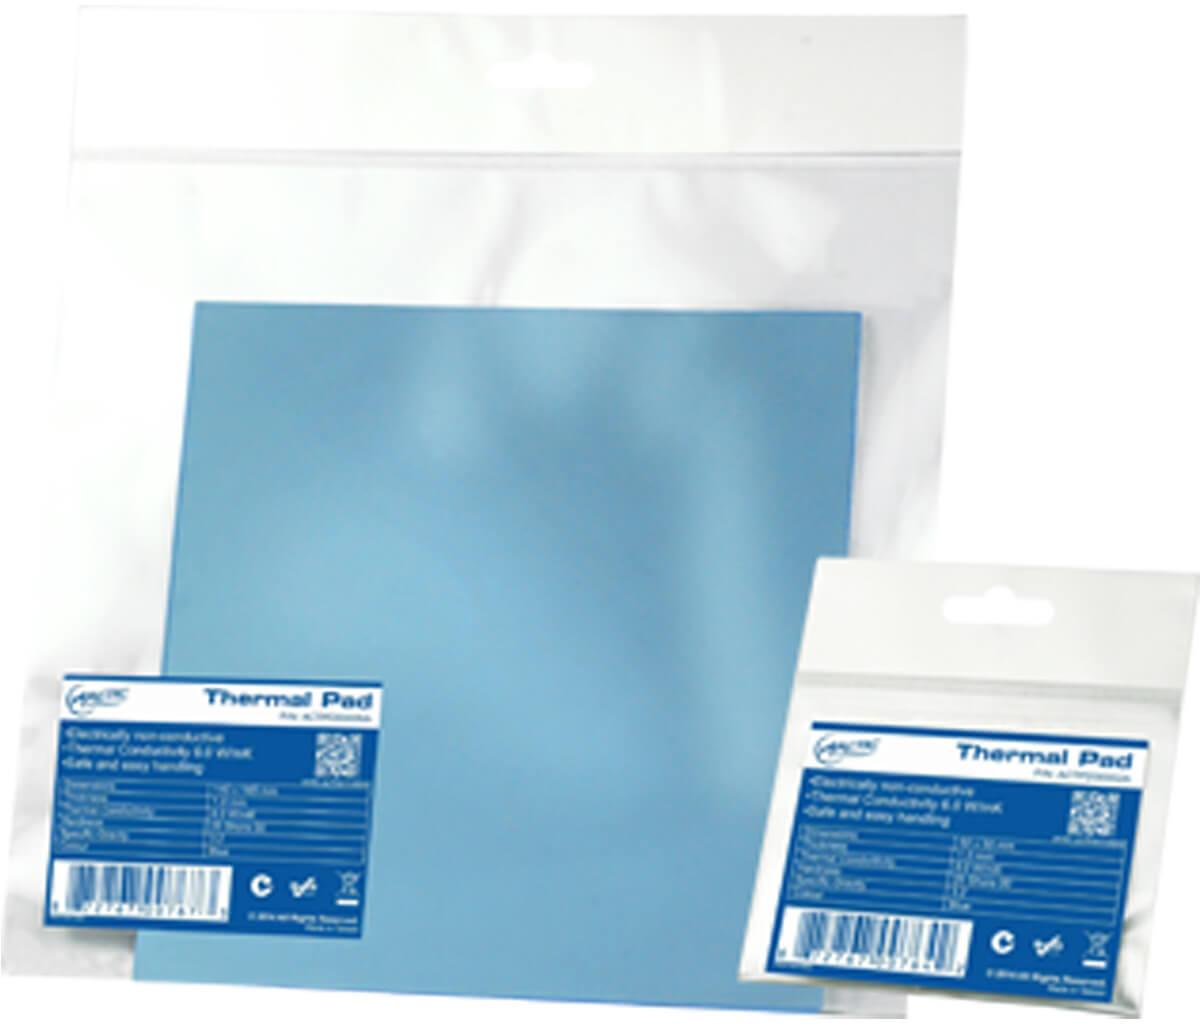 Arctic - Thermal Pad Arctic 145 x 145 x 0,5mm